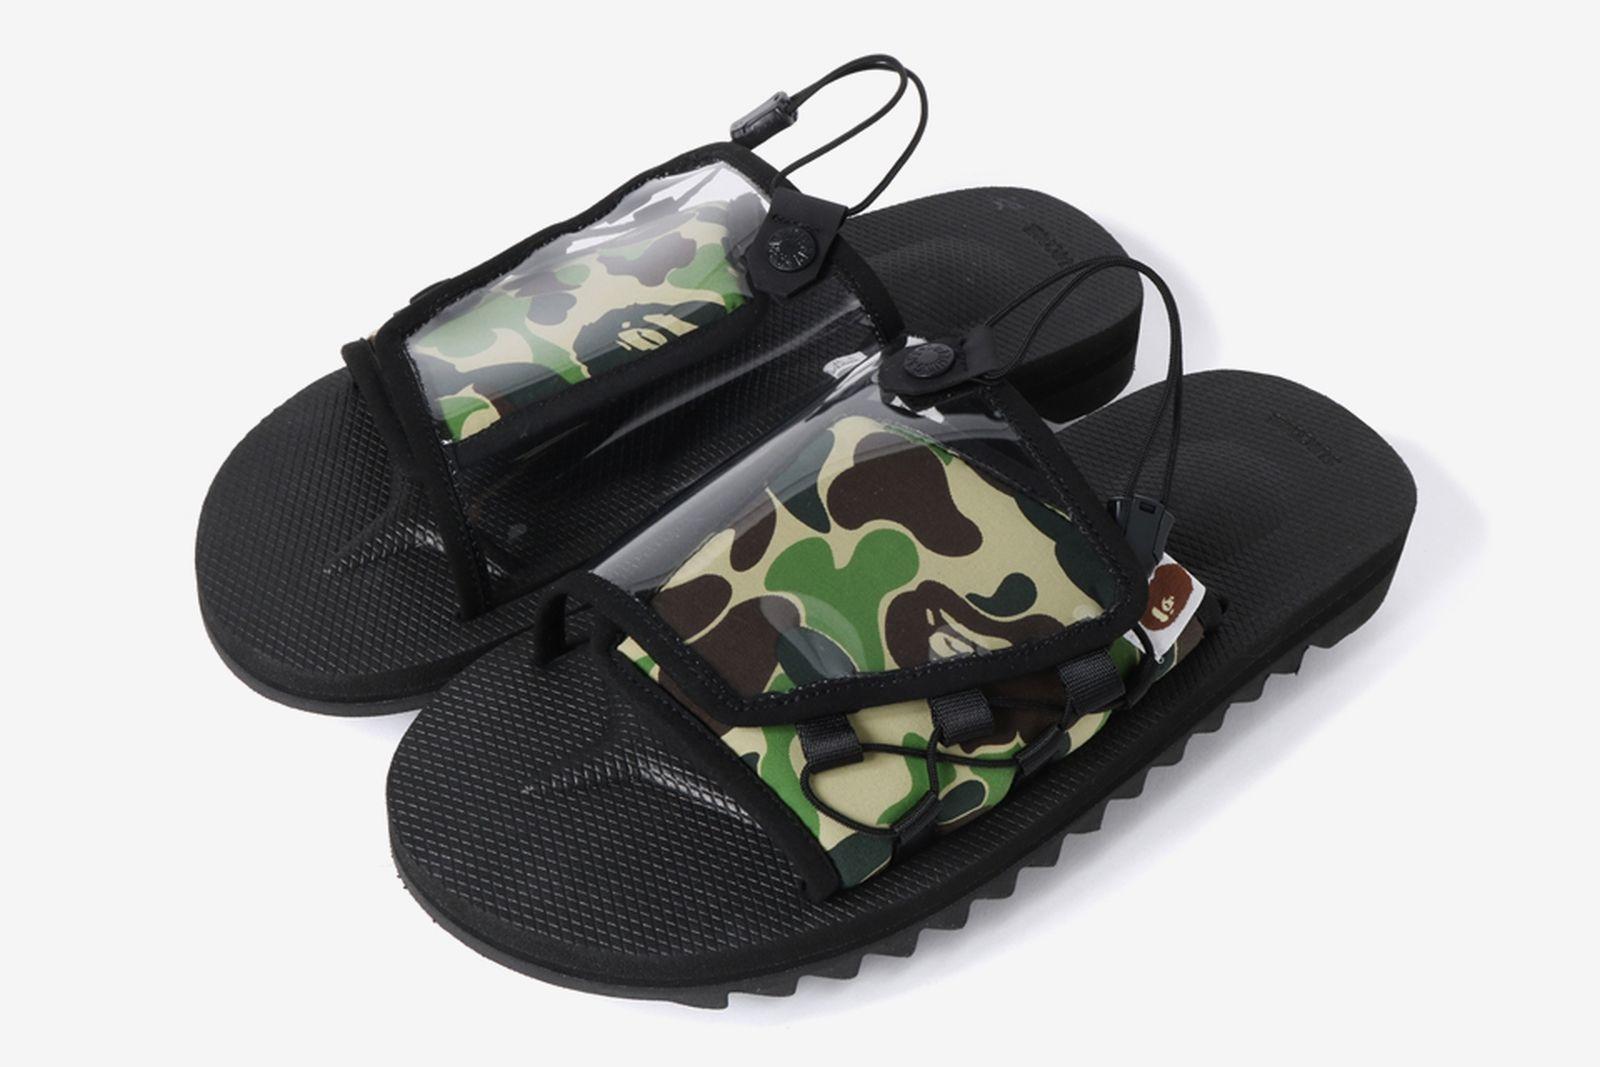 bape suicoke ss19 sandals release date price A Bathing Ape